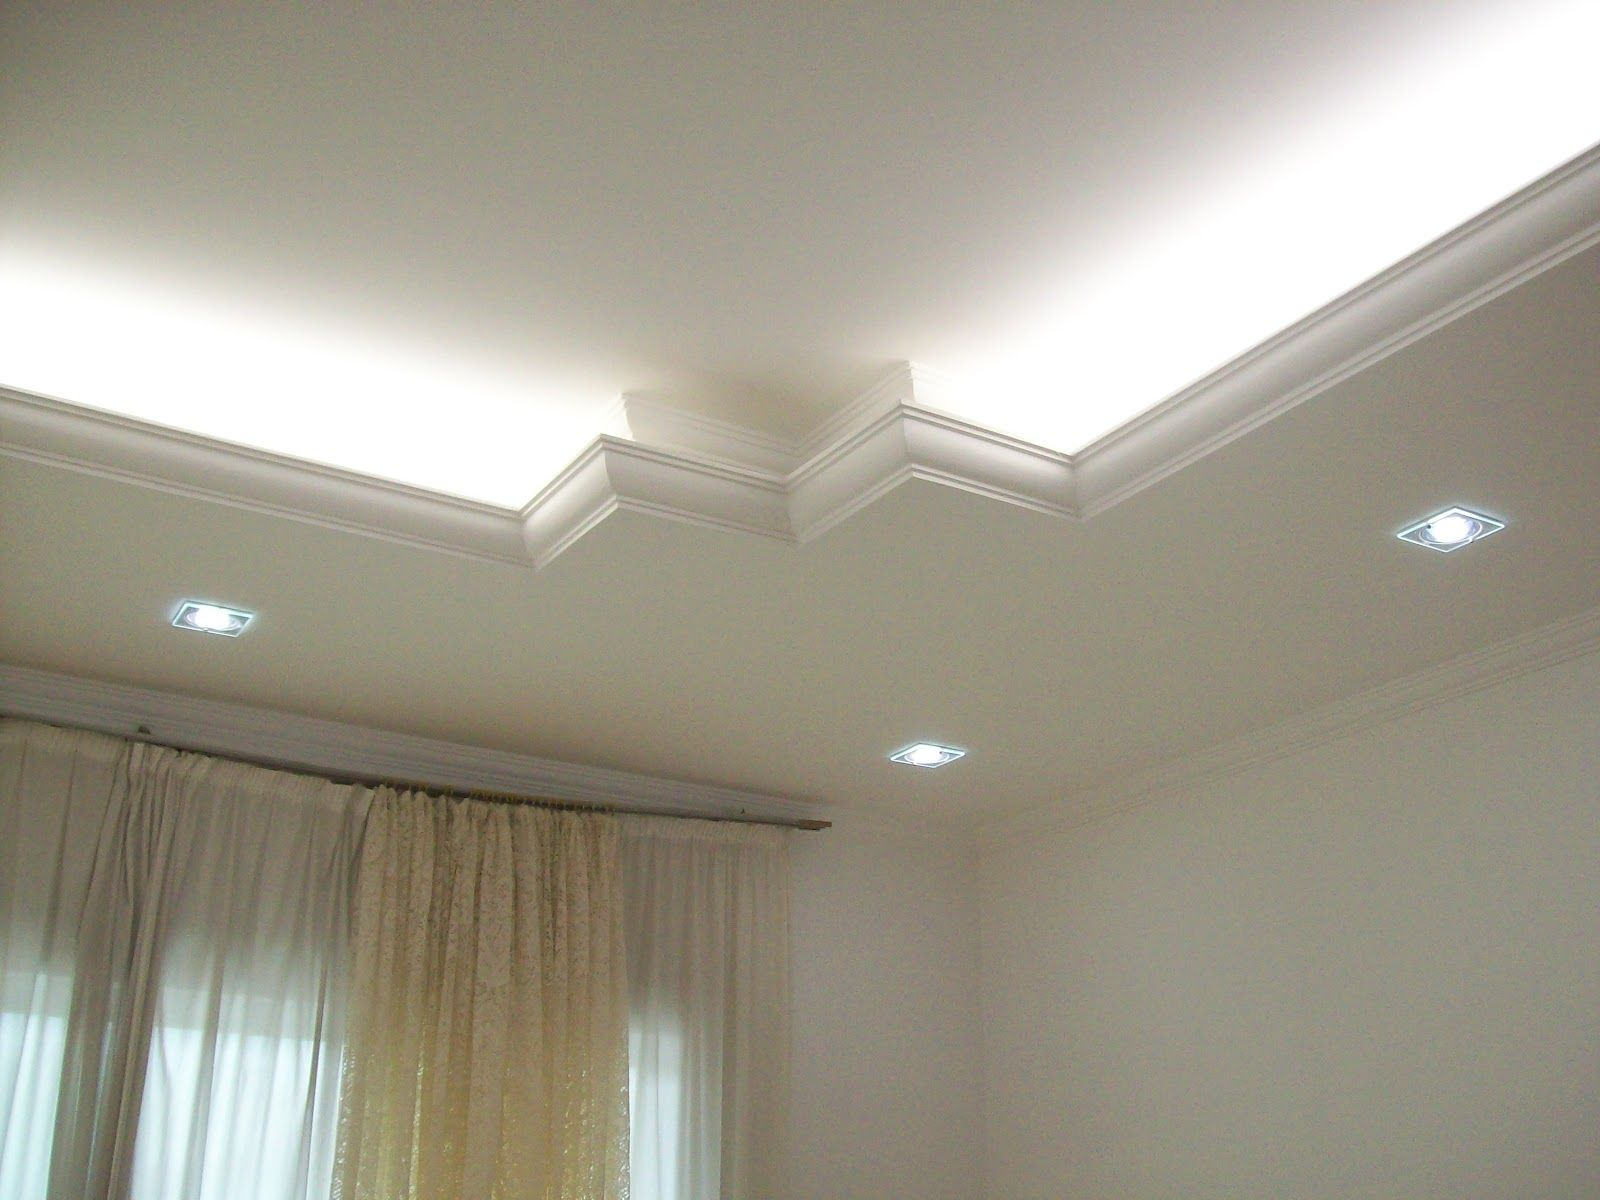 J marcos gesso modelos de forro iluminaci n for Sala de estar iluminacion